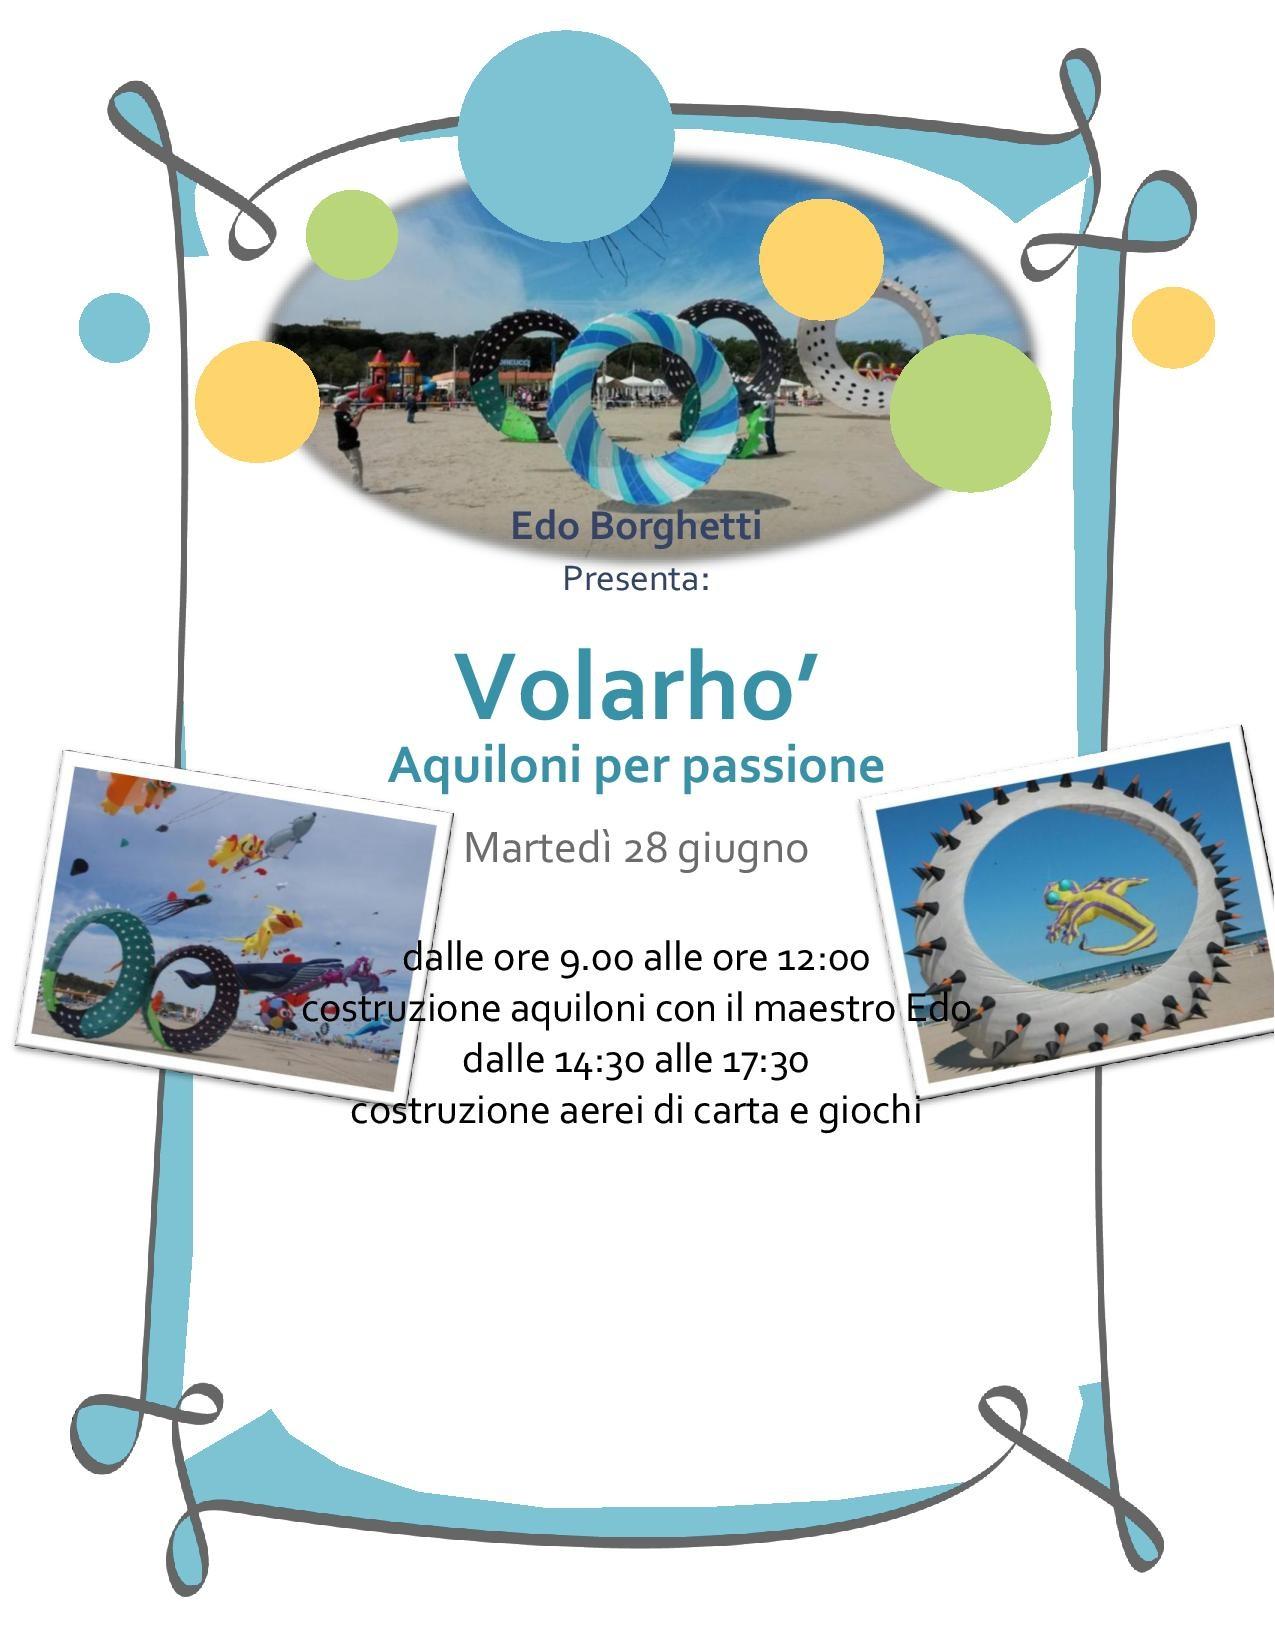 VOLANTINO VOLARHO -page-001locupp